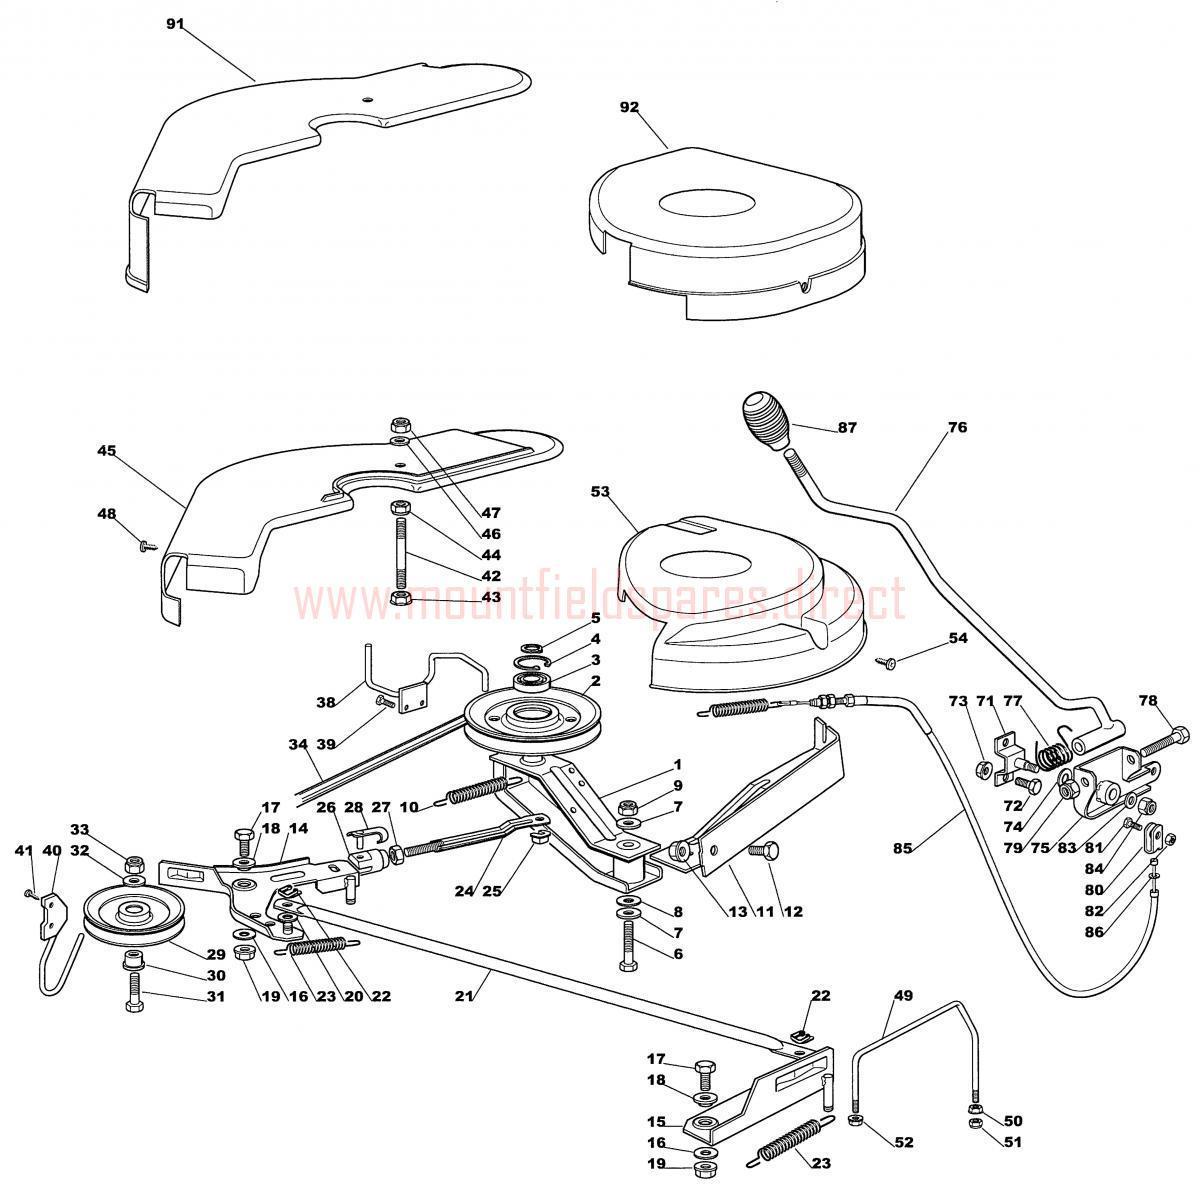 Bolens push mower model 02b assembly